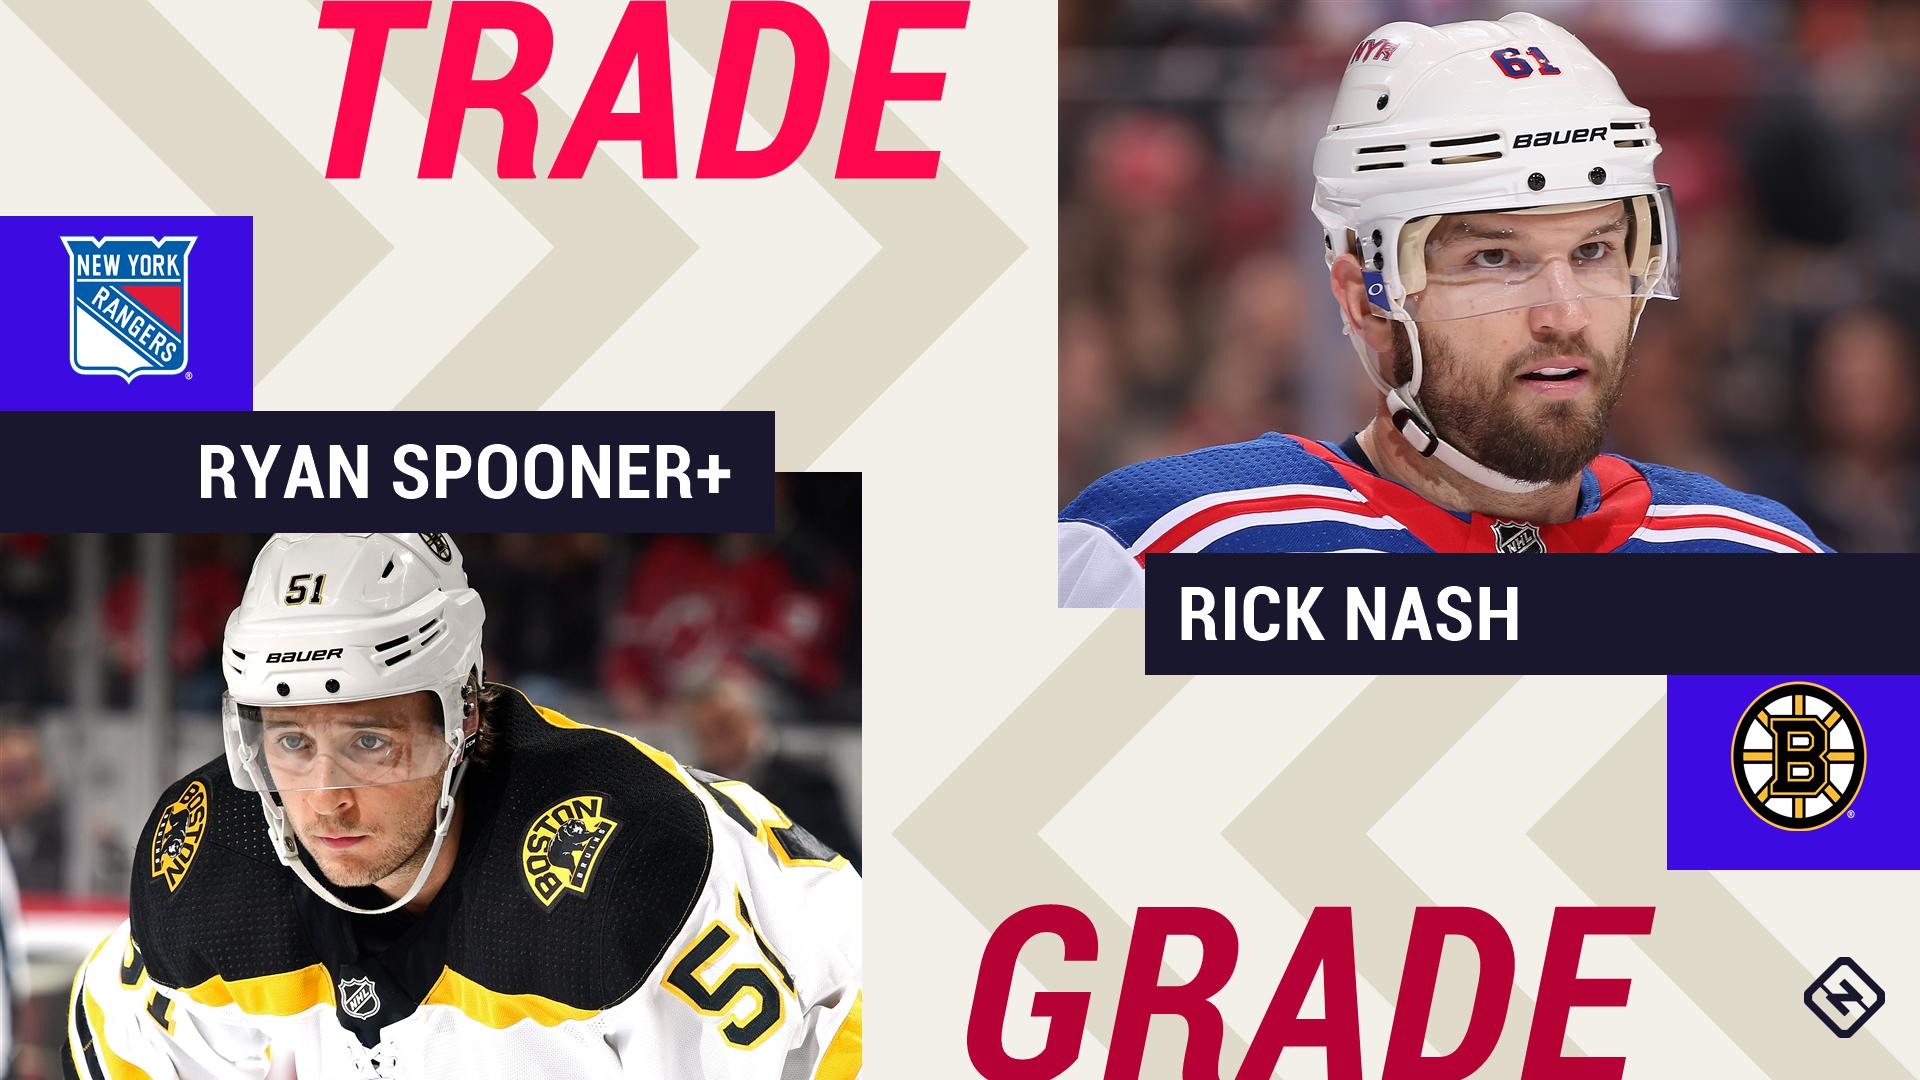 Rangers reach trade sending six-time All-Star Rick Nash to Bruins